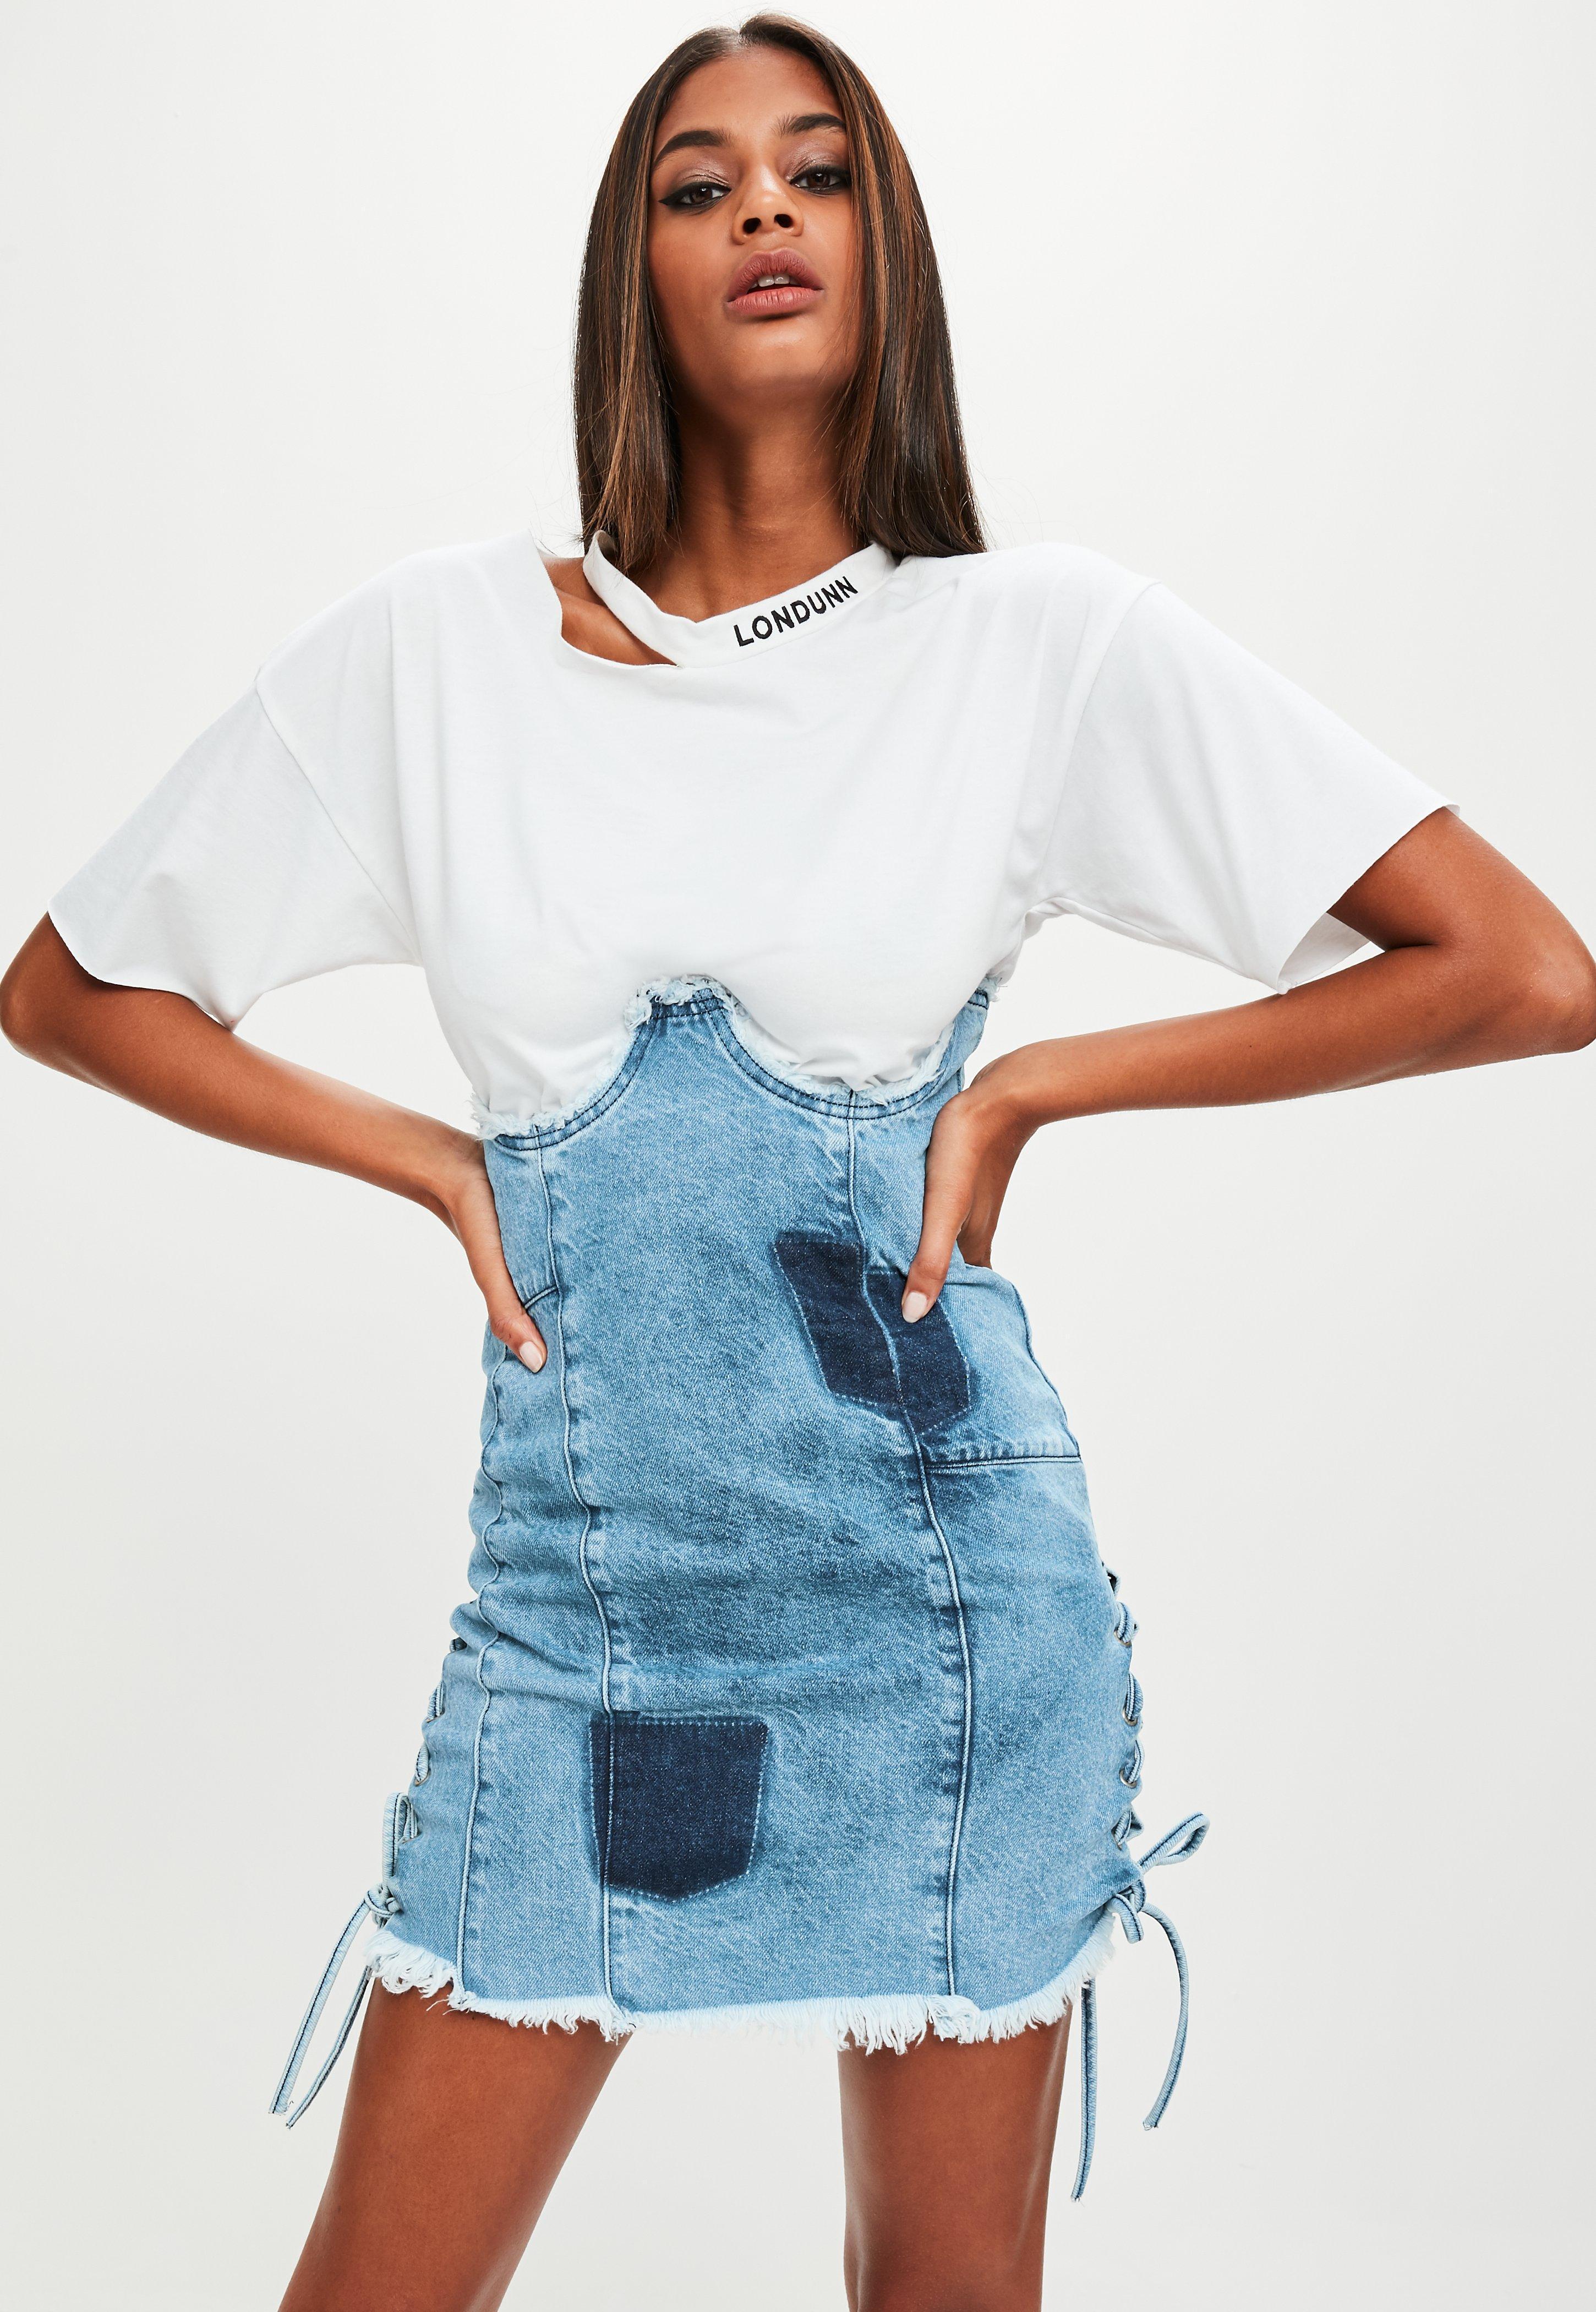 bf21efc683 Lyst - Missguided Londunn + Blue Denim High Waist Denim Skirt in Blue